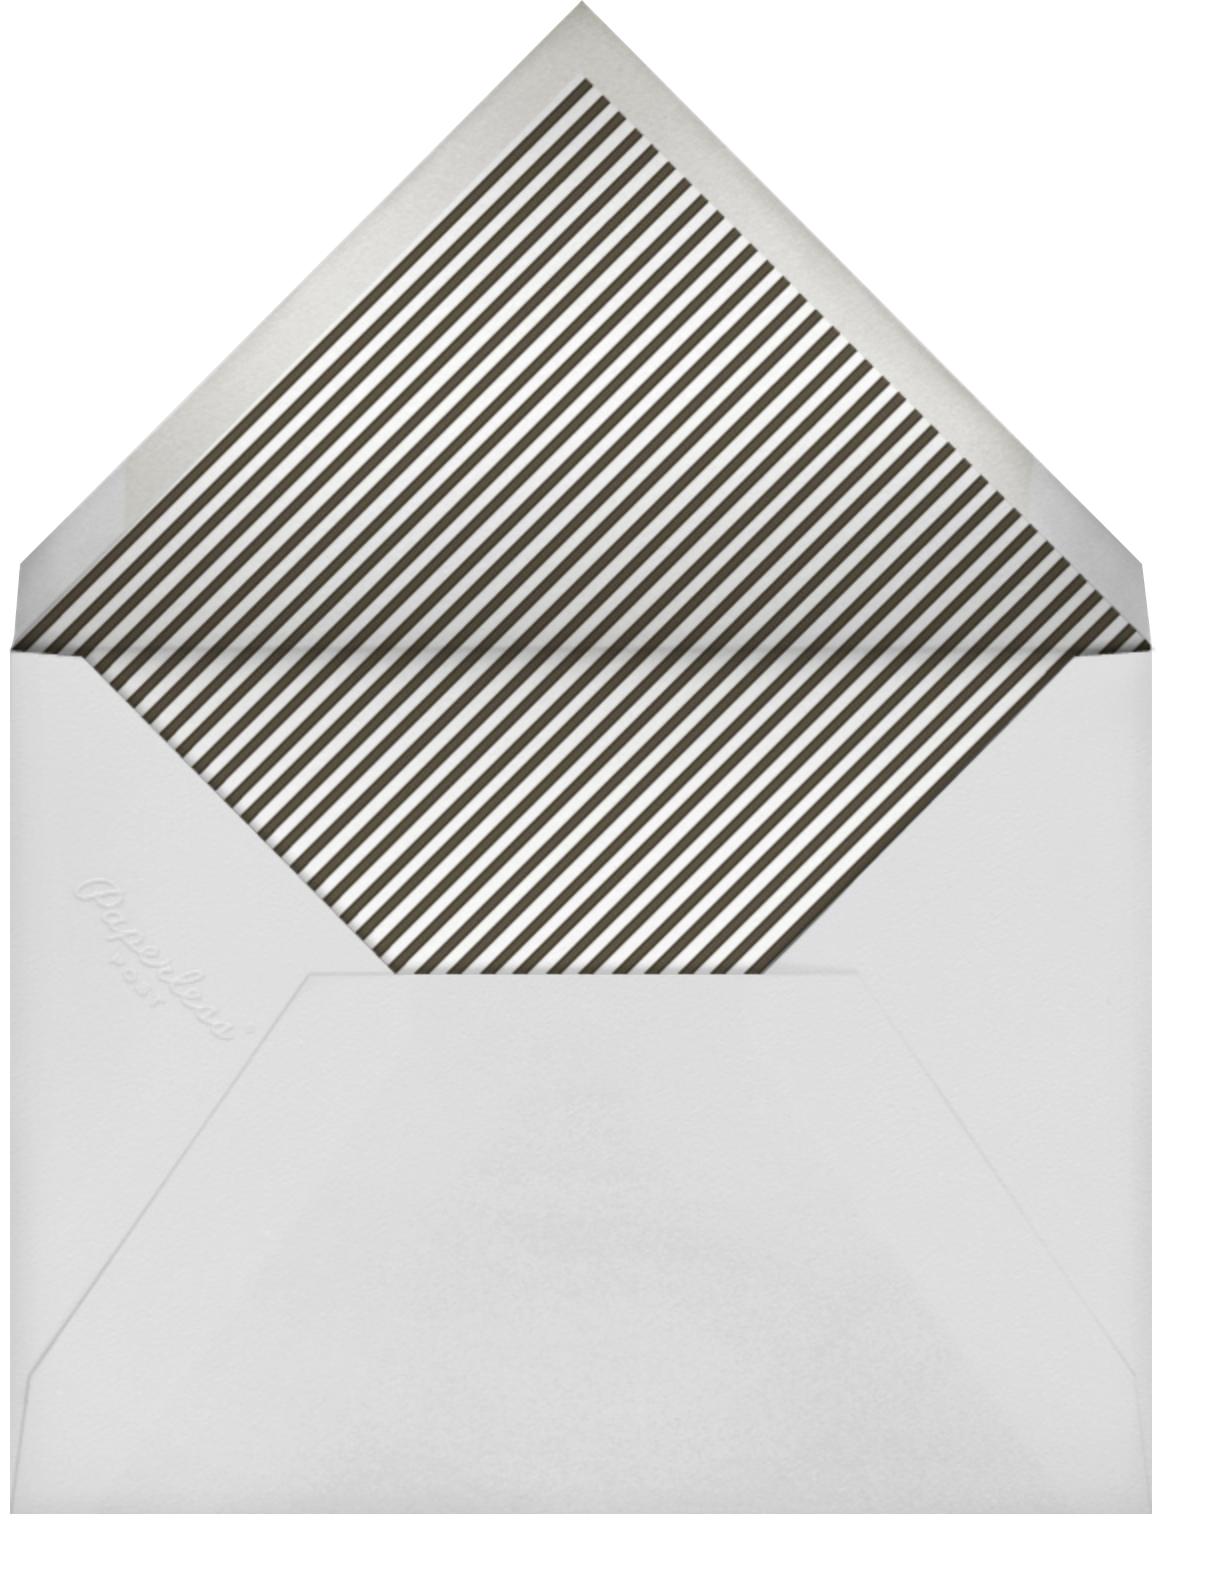 Forsythia (Horizontal) - Silver - Paperless Post - Adult birthday - envelope back